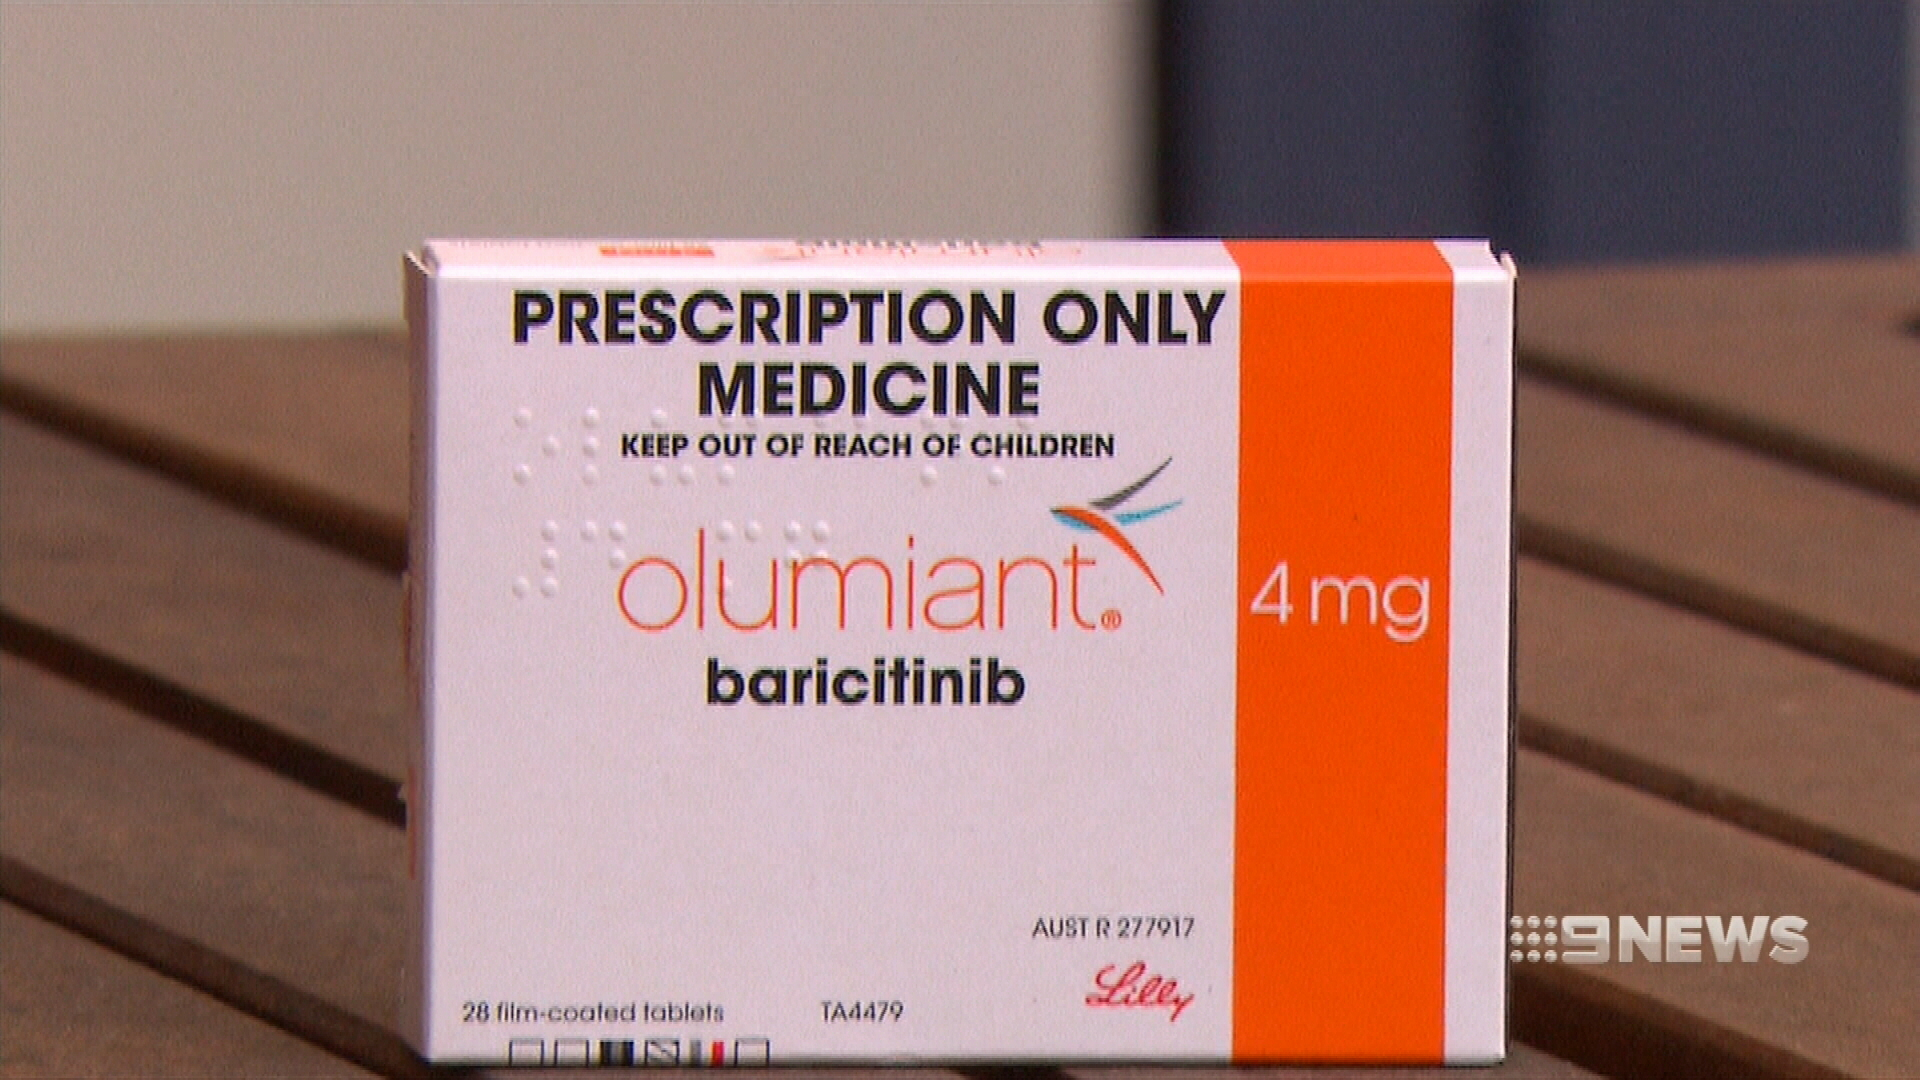 Drugs for rheumatoid arthritis and ADHD listed on PBS